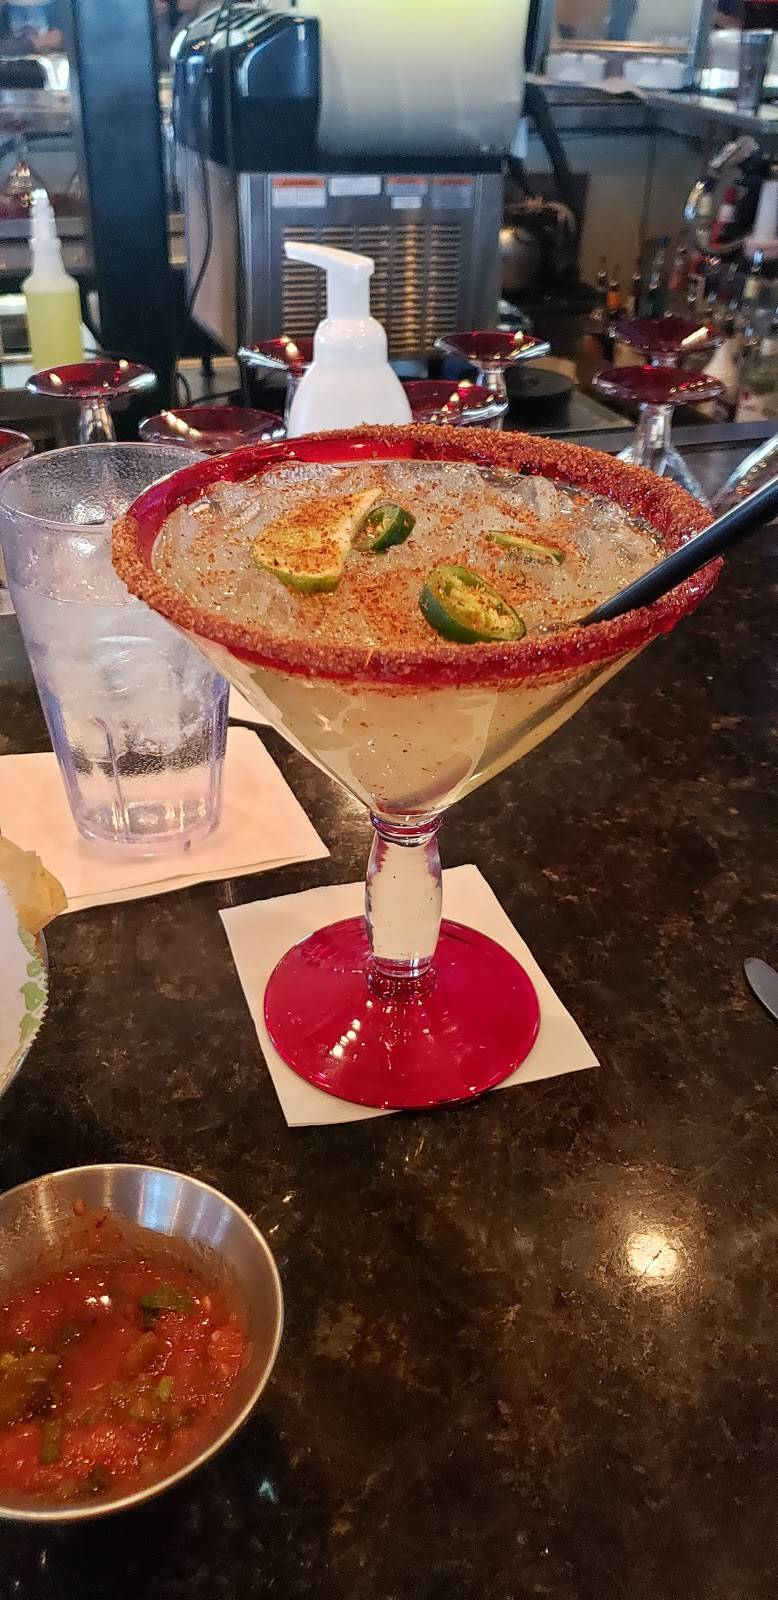 Jose Peppers Mexican Restaurant - restaurant    Photo 7 of 7   Address: 13770 S Black Bob Rd, Olathe, KS 66062, USA   Phone: (913) 393-0444